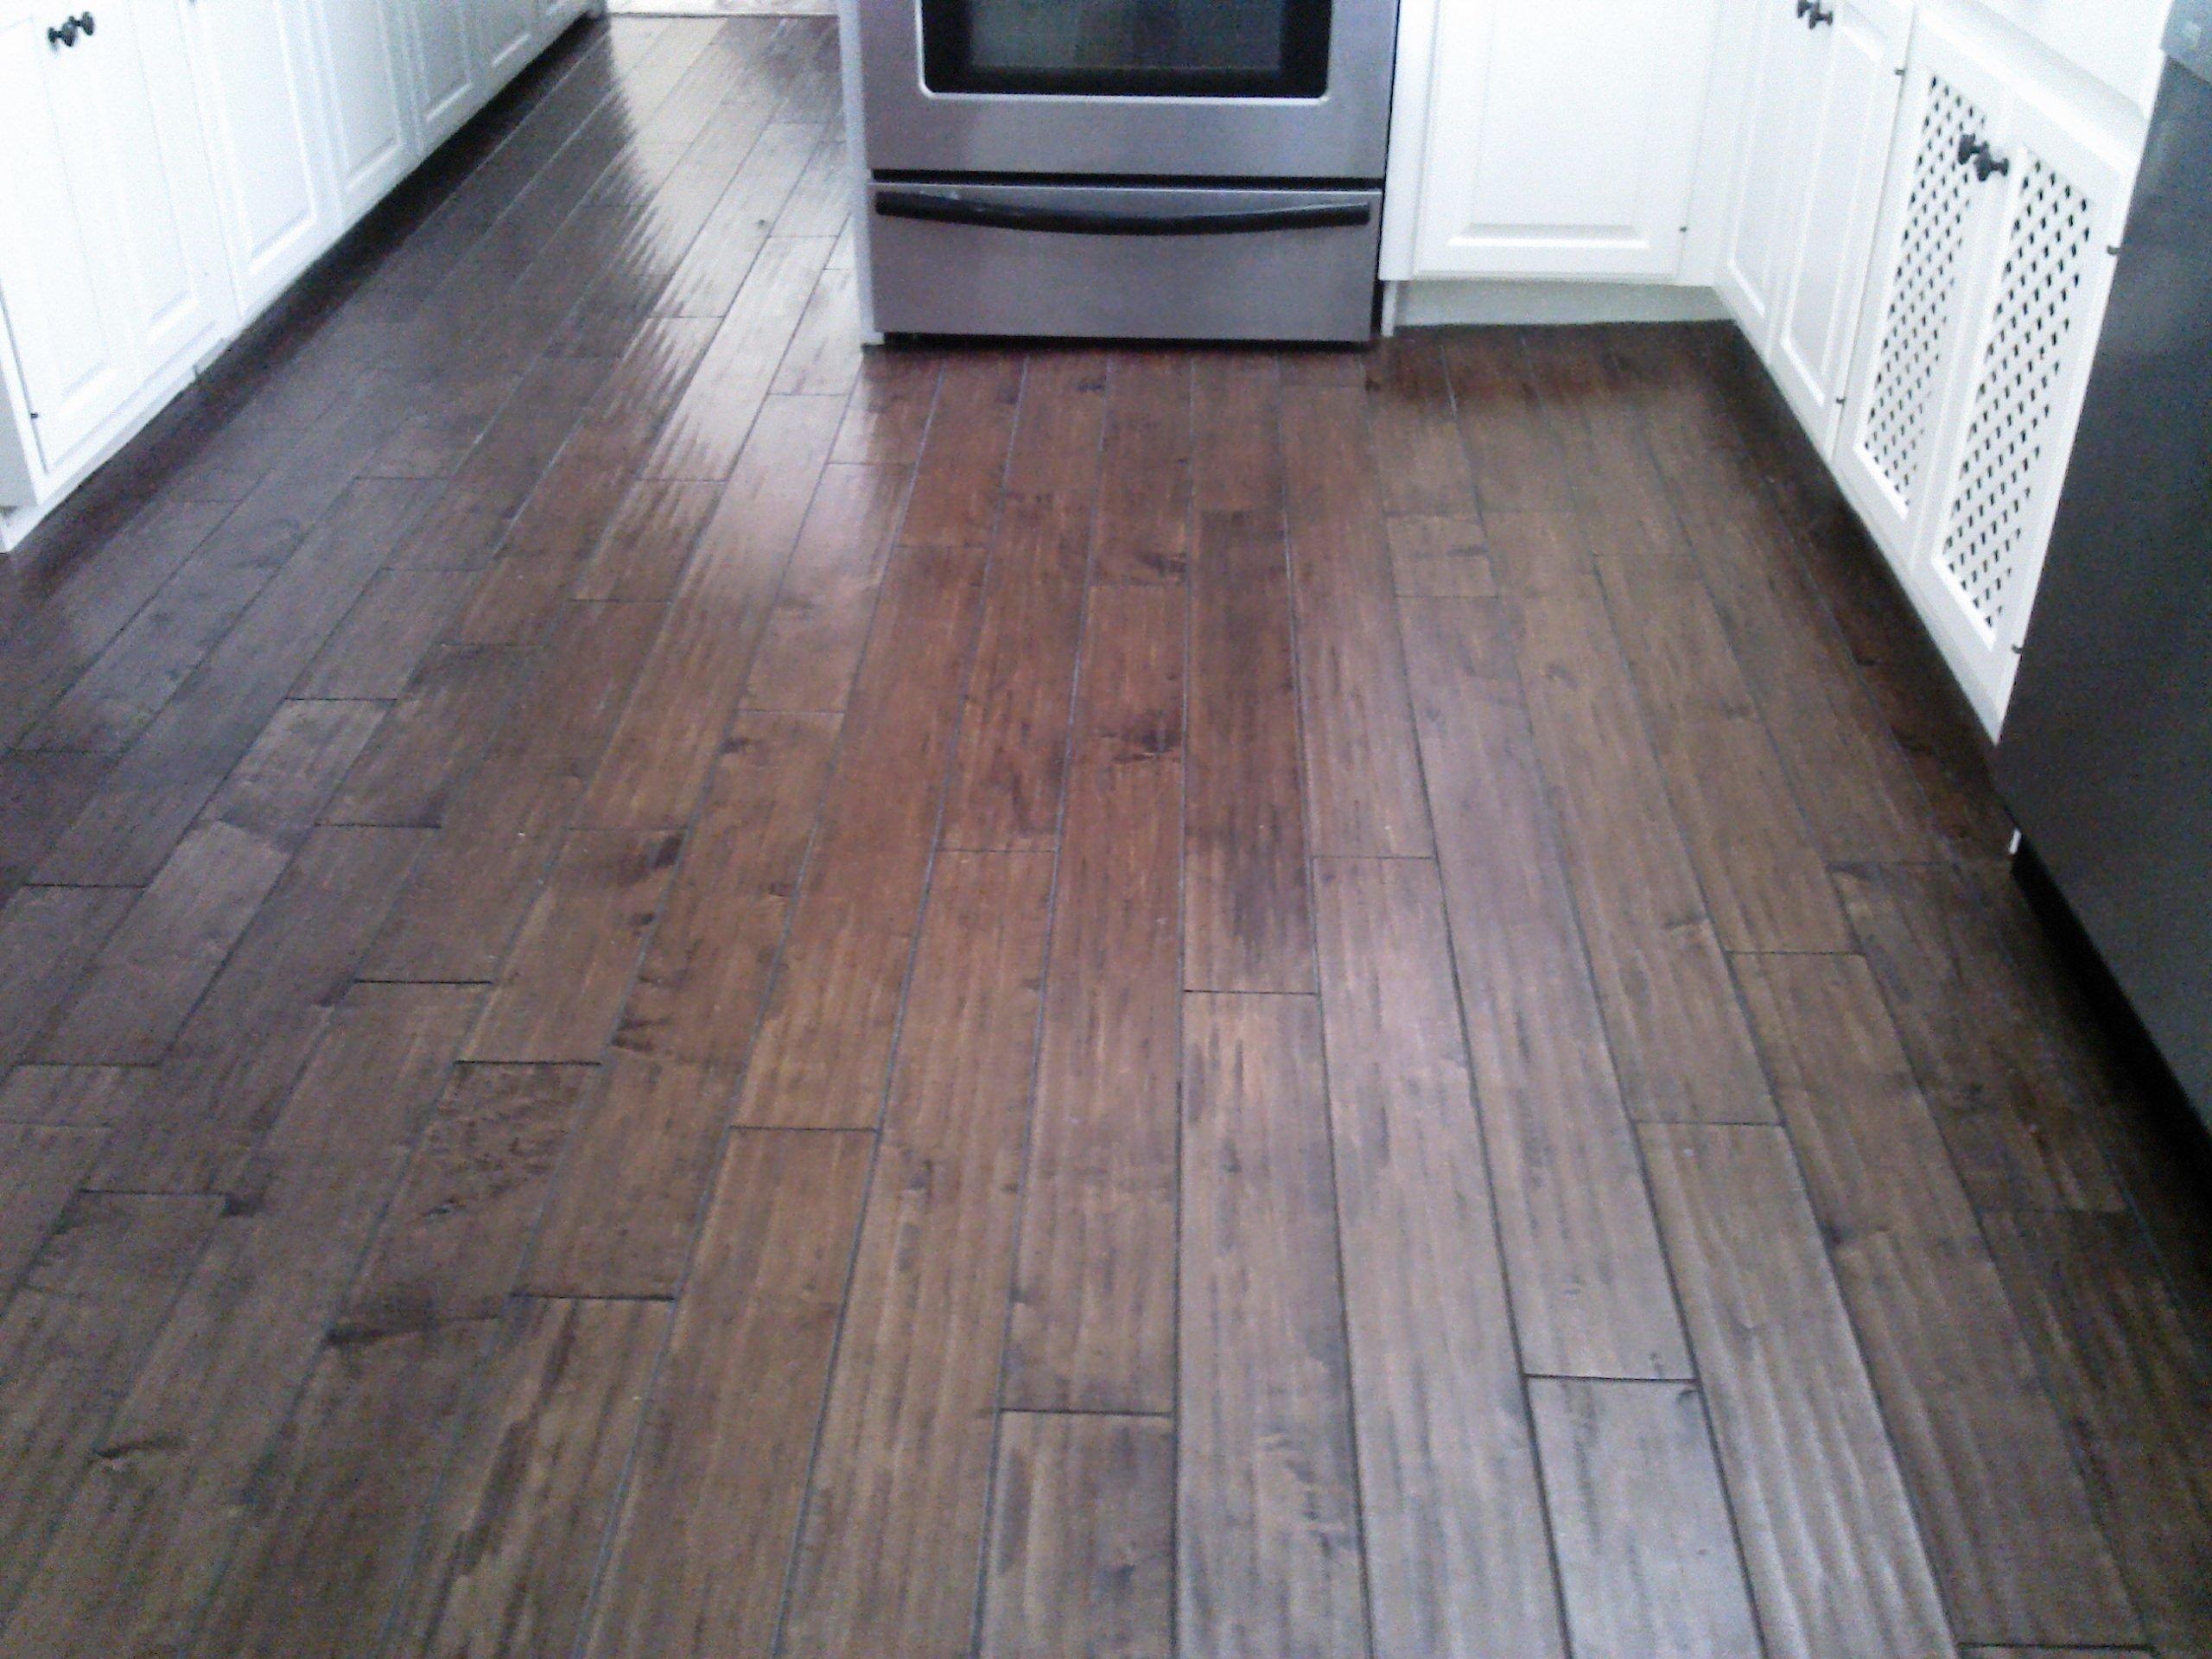 Laminate Wood Flooring in Kitchen Ratings Reviews laminate flooring for kitchen